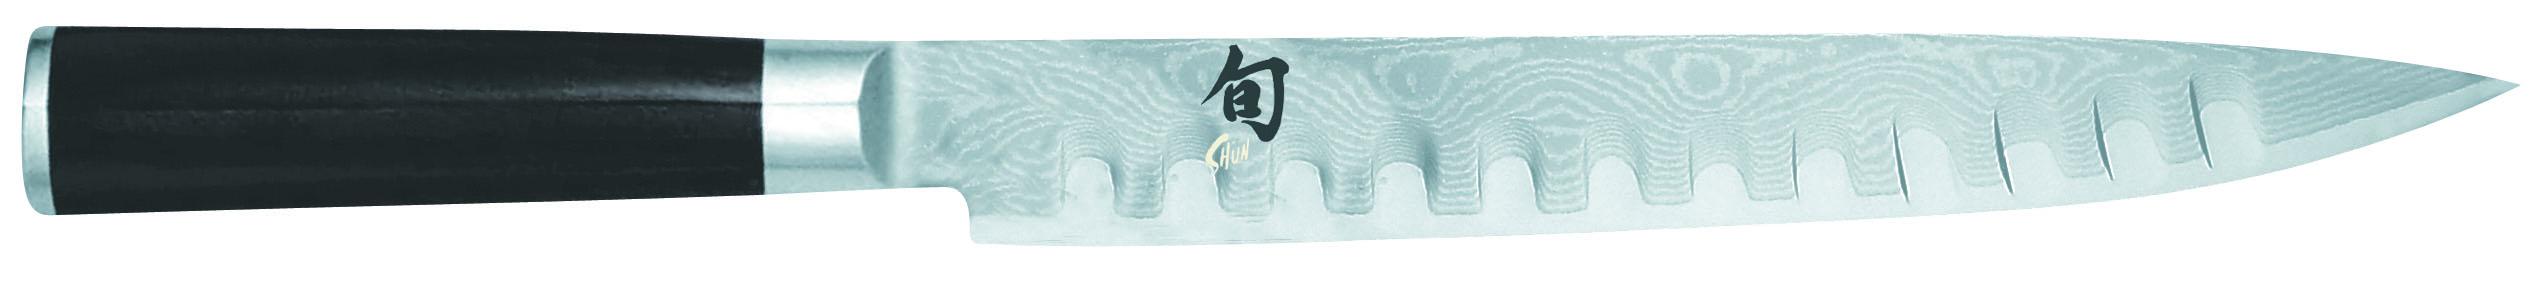 Kai Shun Classic DM-0720 Trancherkniv Olivslipad 23 cm